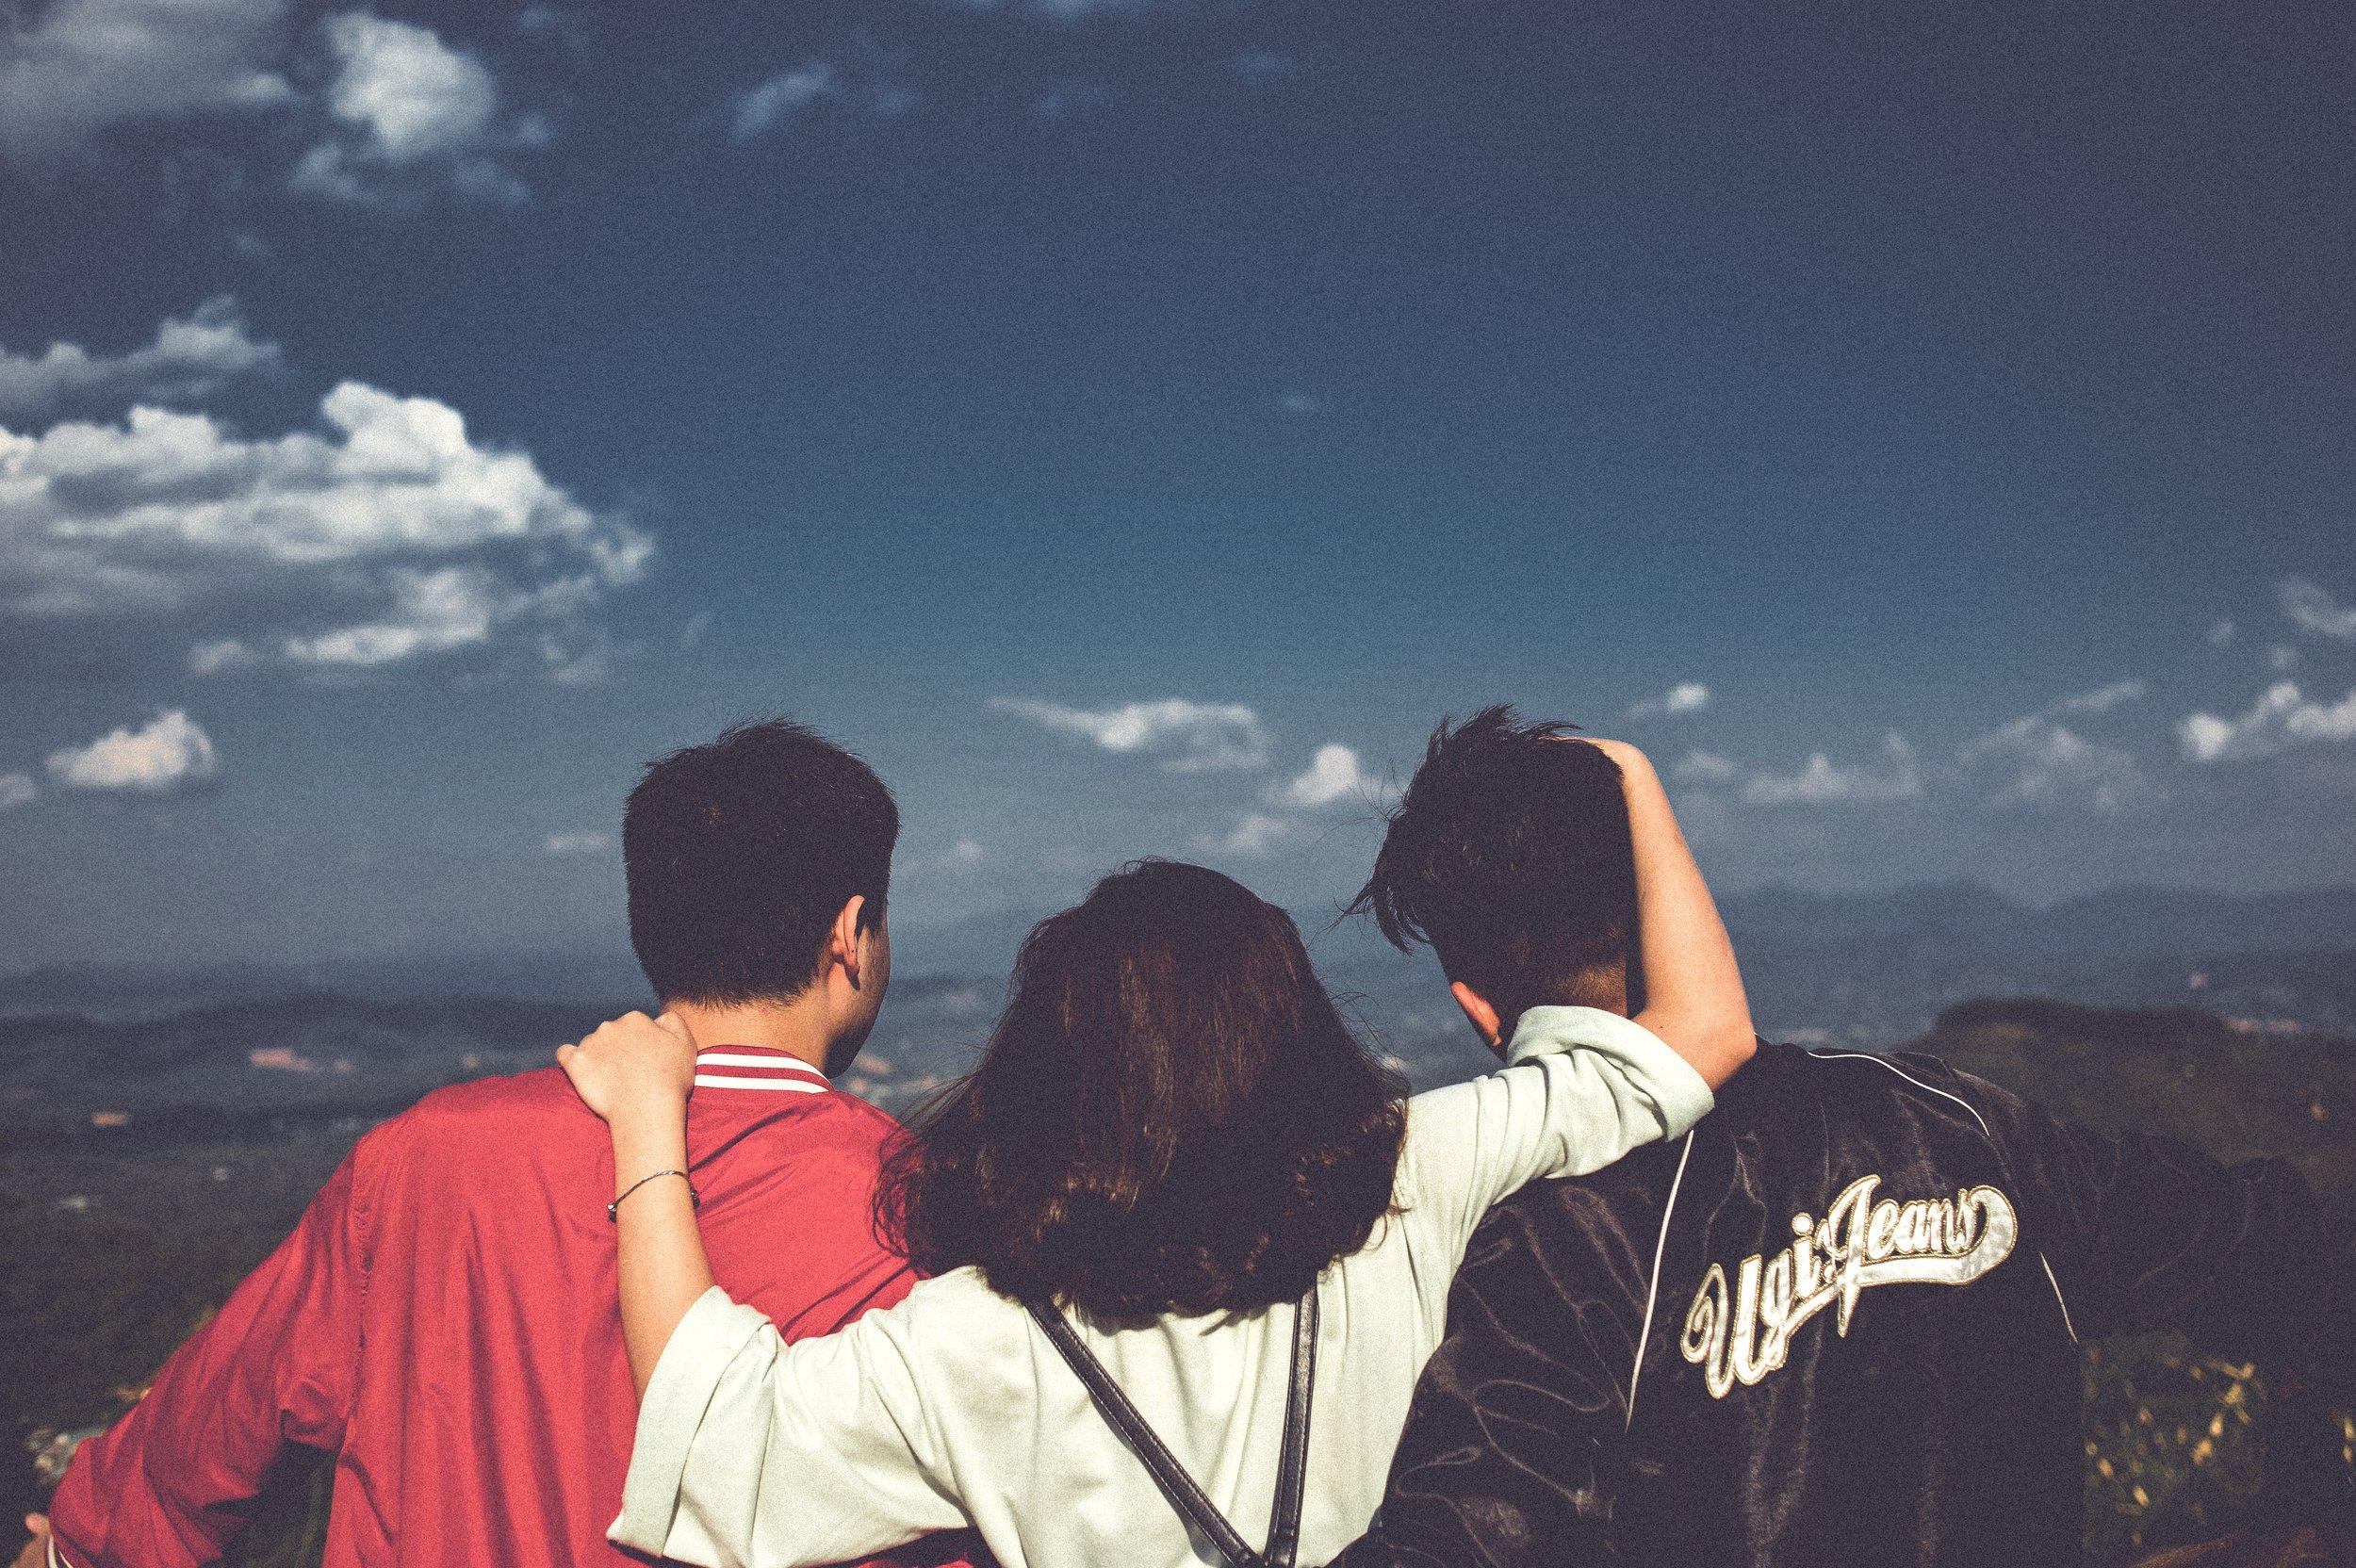 boys-friends-girl-1255062.jpg